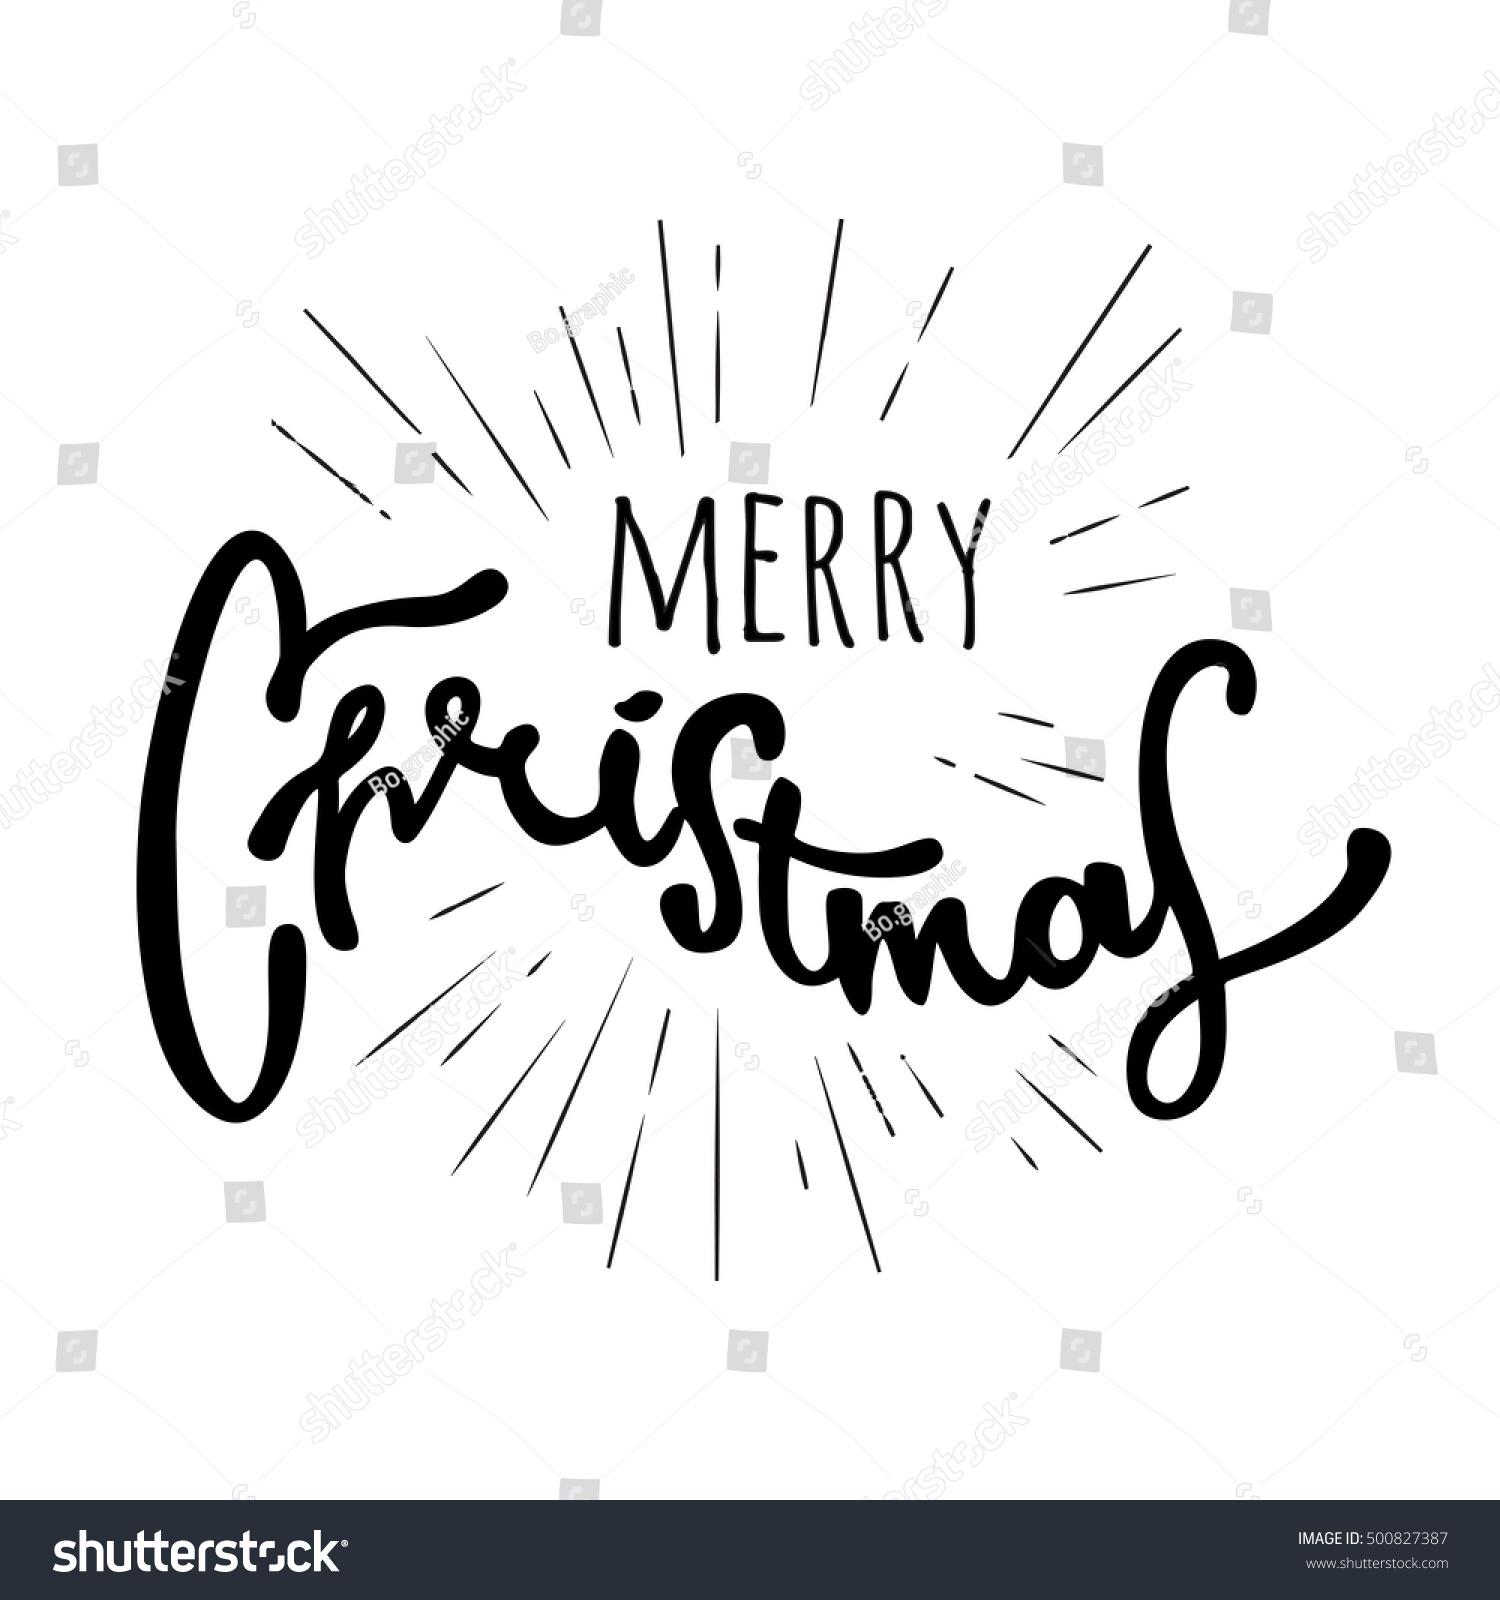 Merry christmas hand drawn retro design stock vector